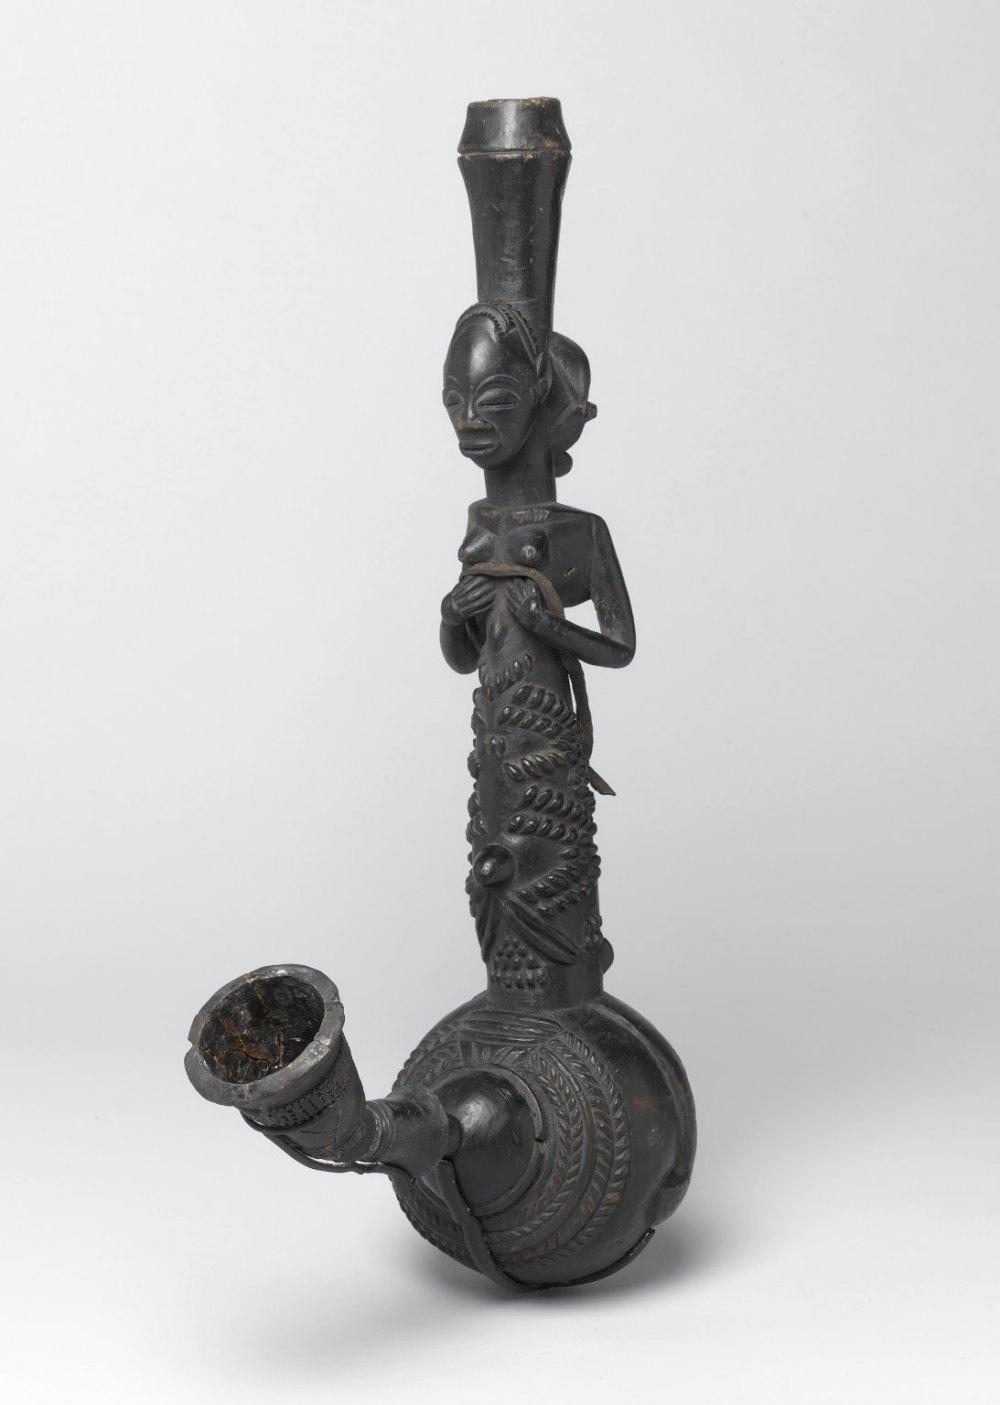 medium resolution of file brooklyn museum 22 1108a b water pipe 2 jpg